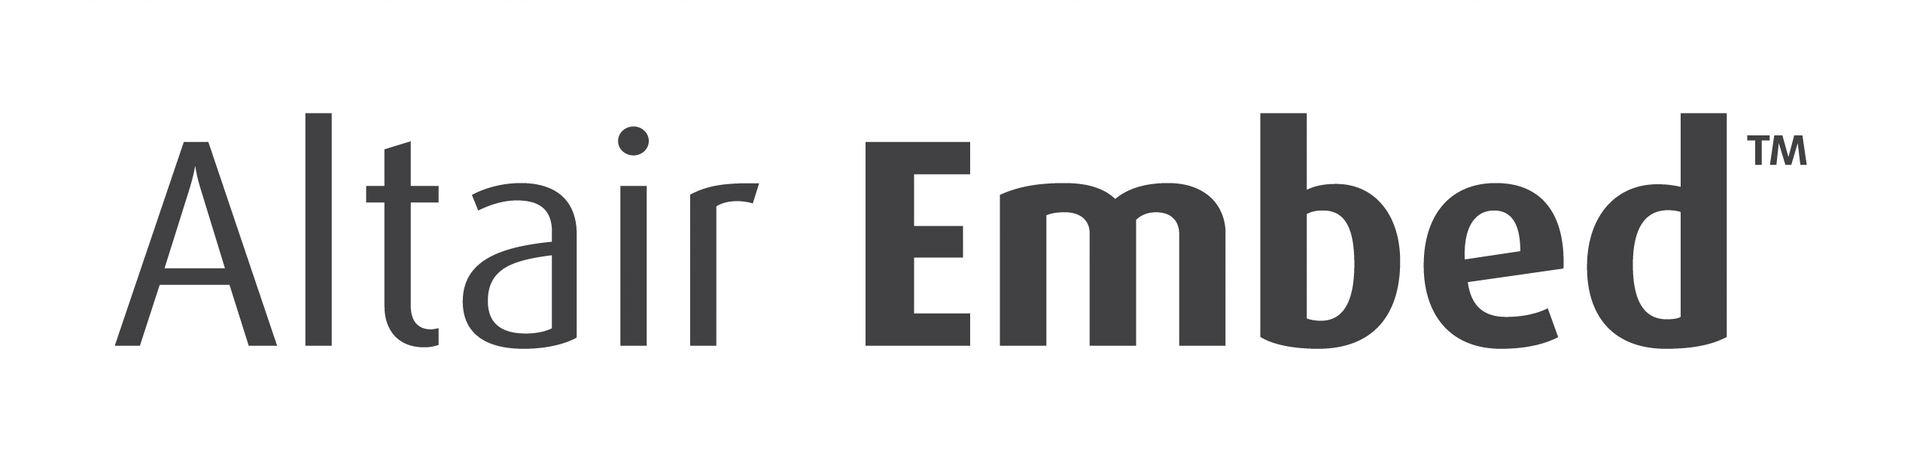 Embed-3.jpg